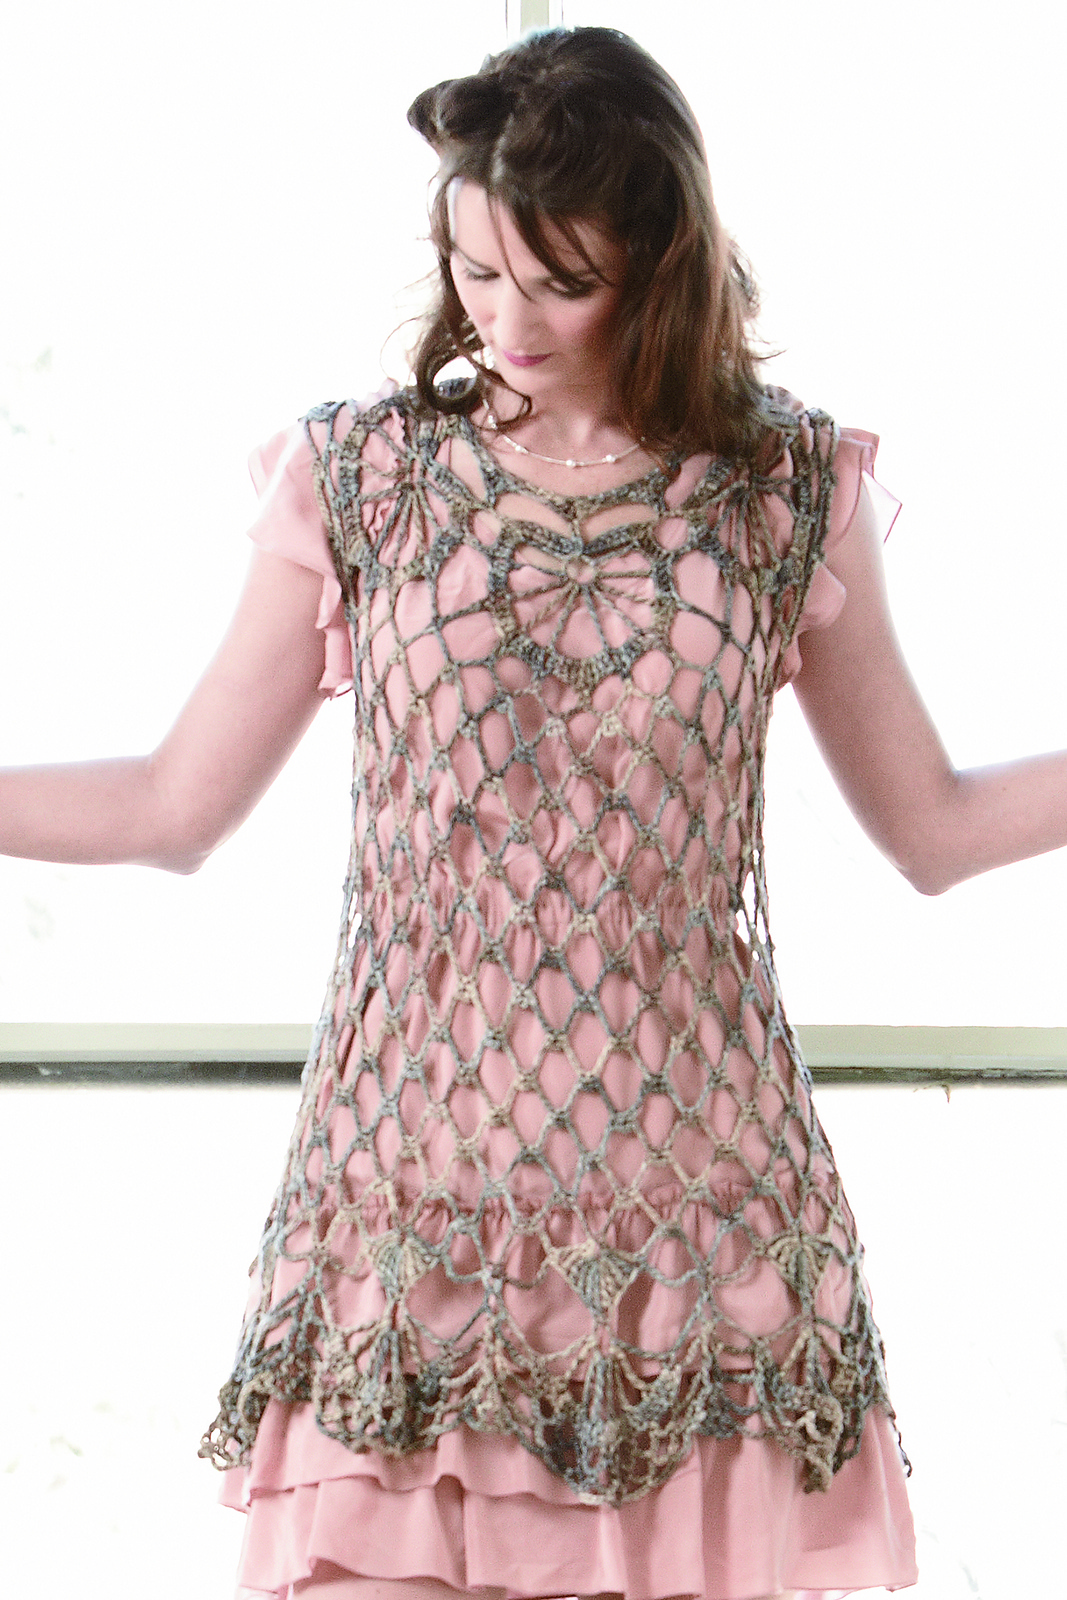 A Pinch of Katy: Crochet Inspiration: Summer Tops